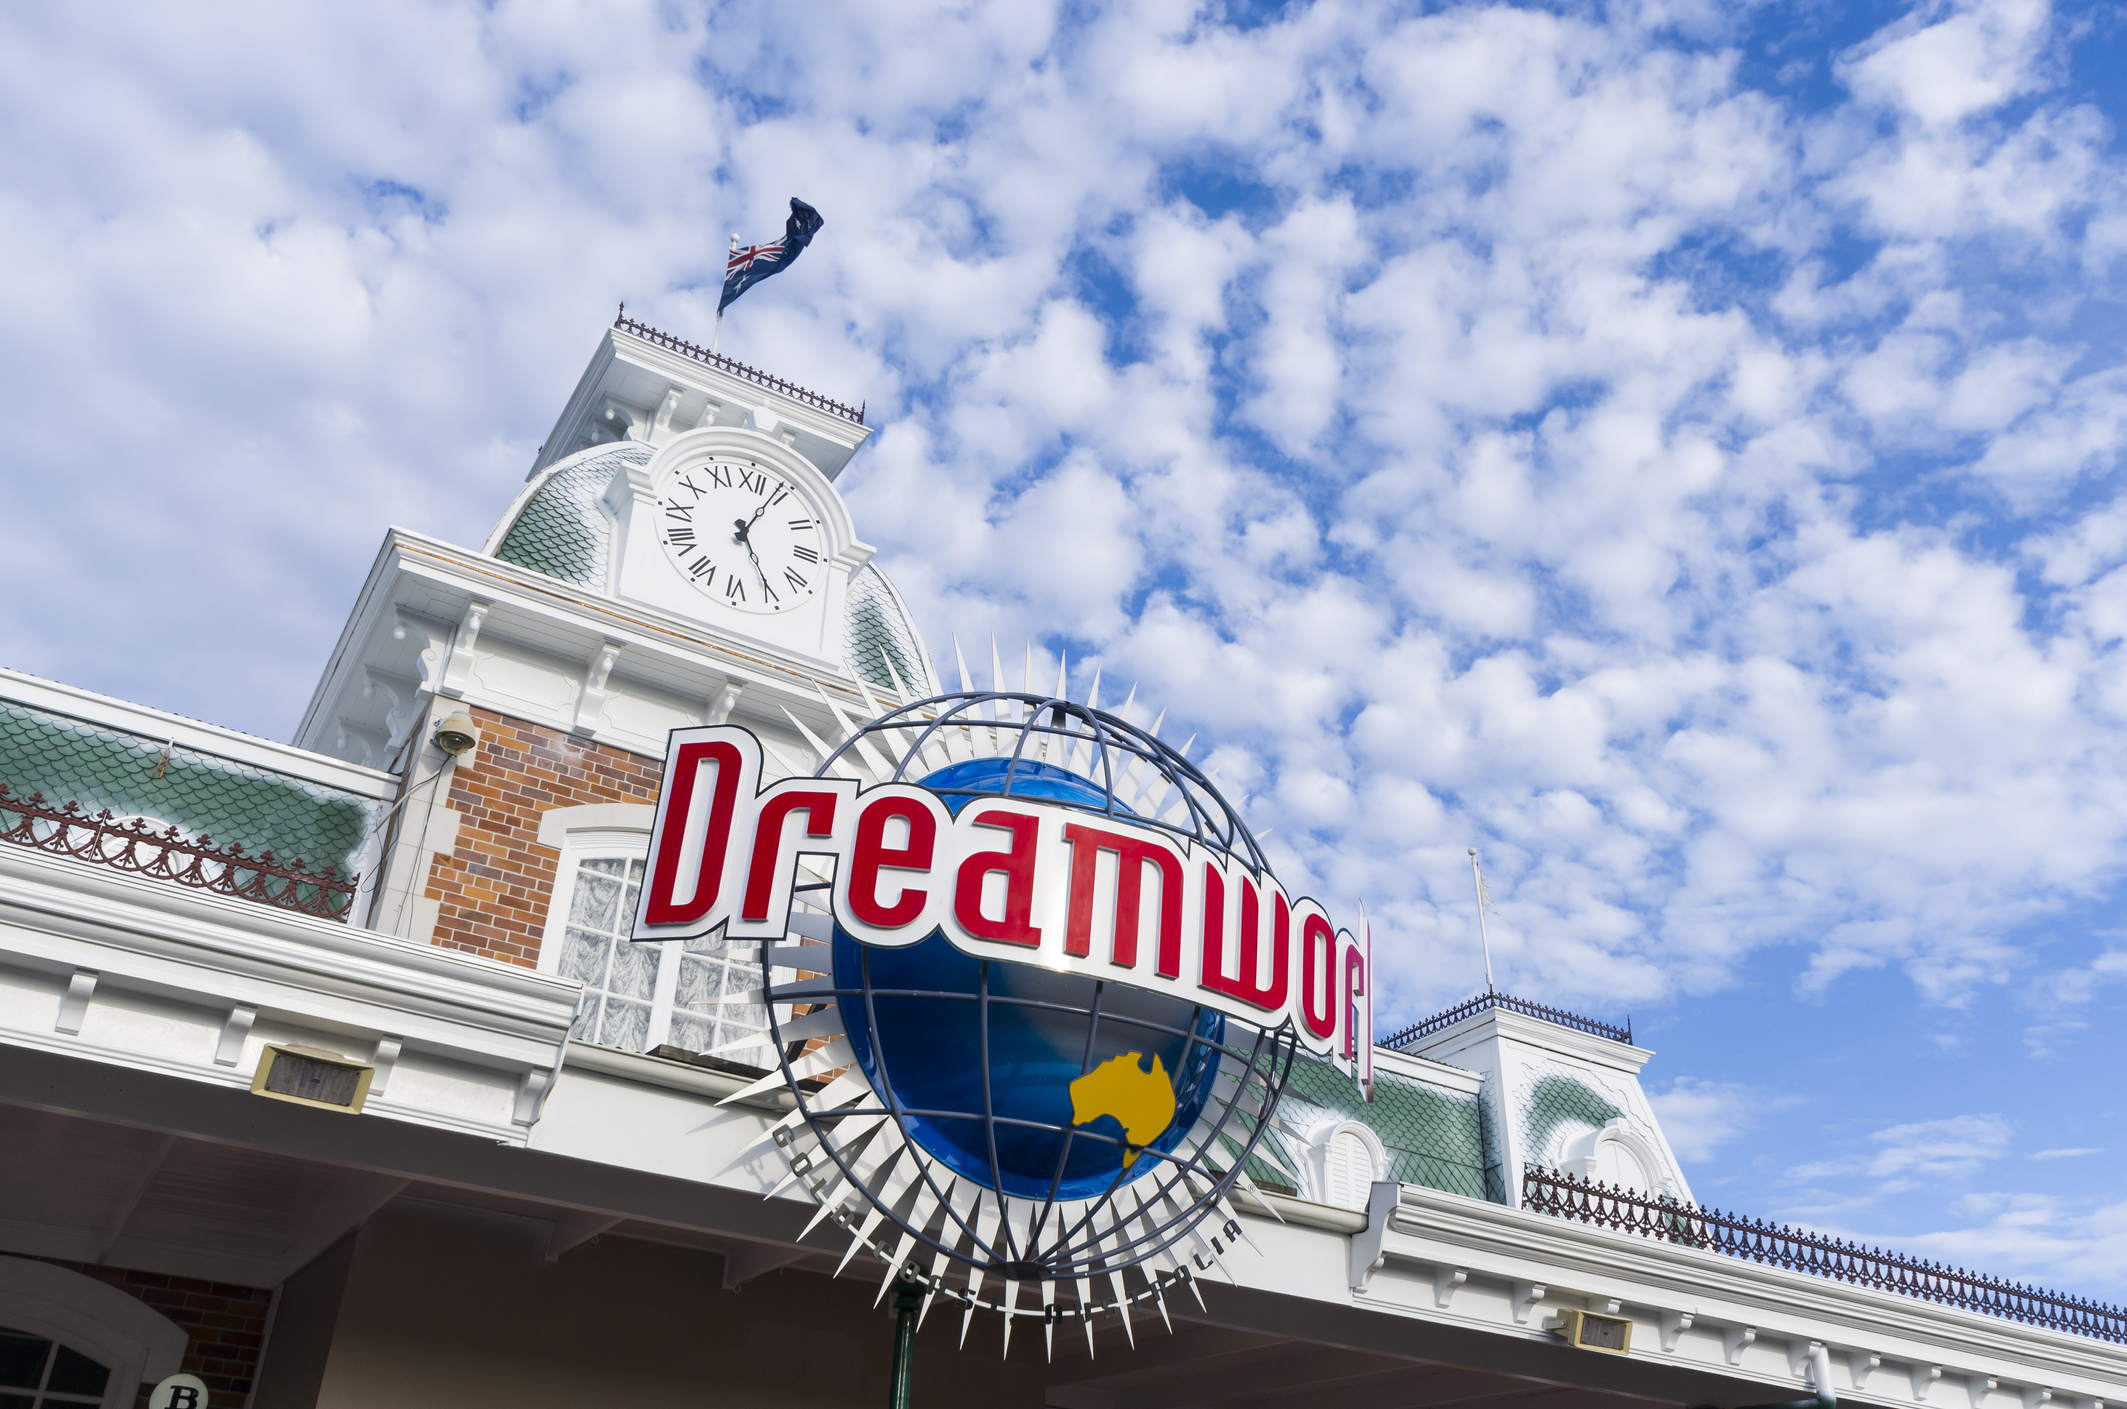 Queenslanders slowly putting their trust back in Dreamworld